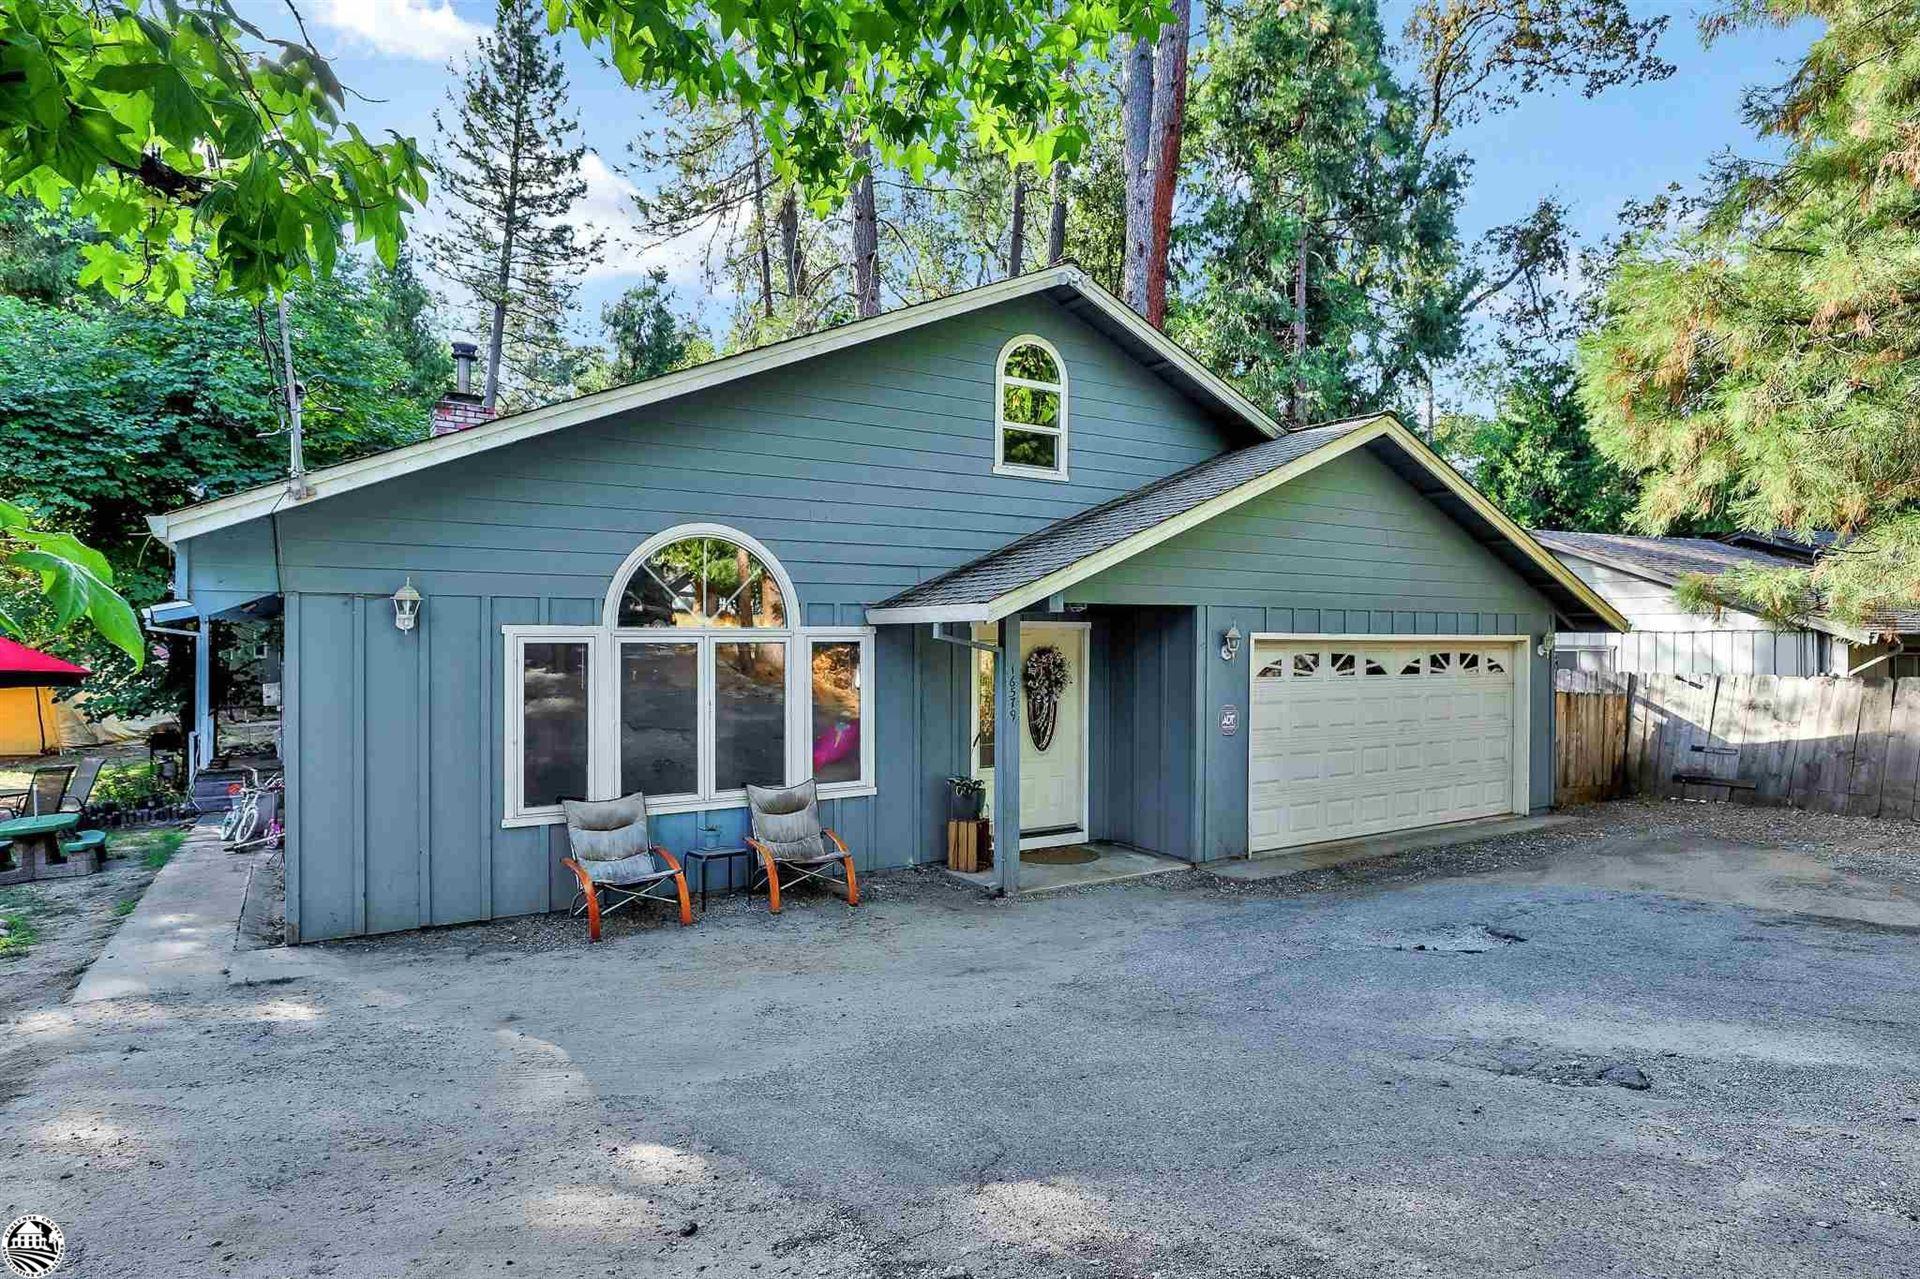 16579 Creekside, Sonora, CA 95370 - MLS#: 20200879